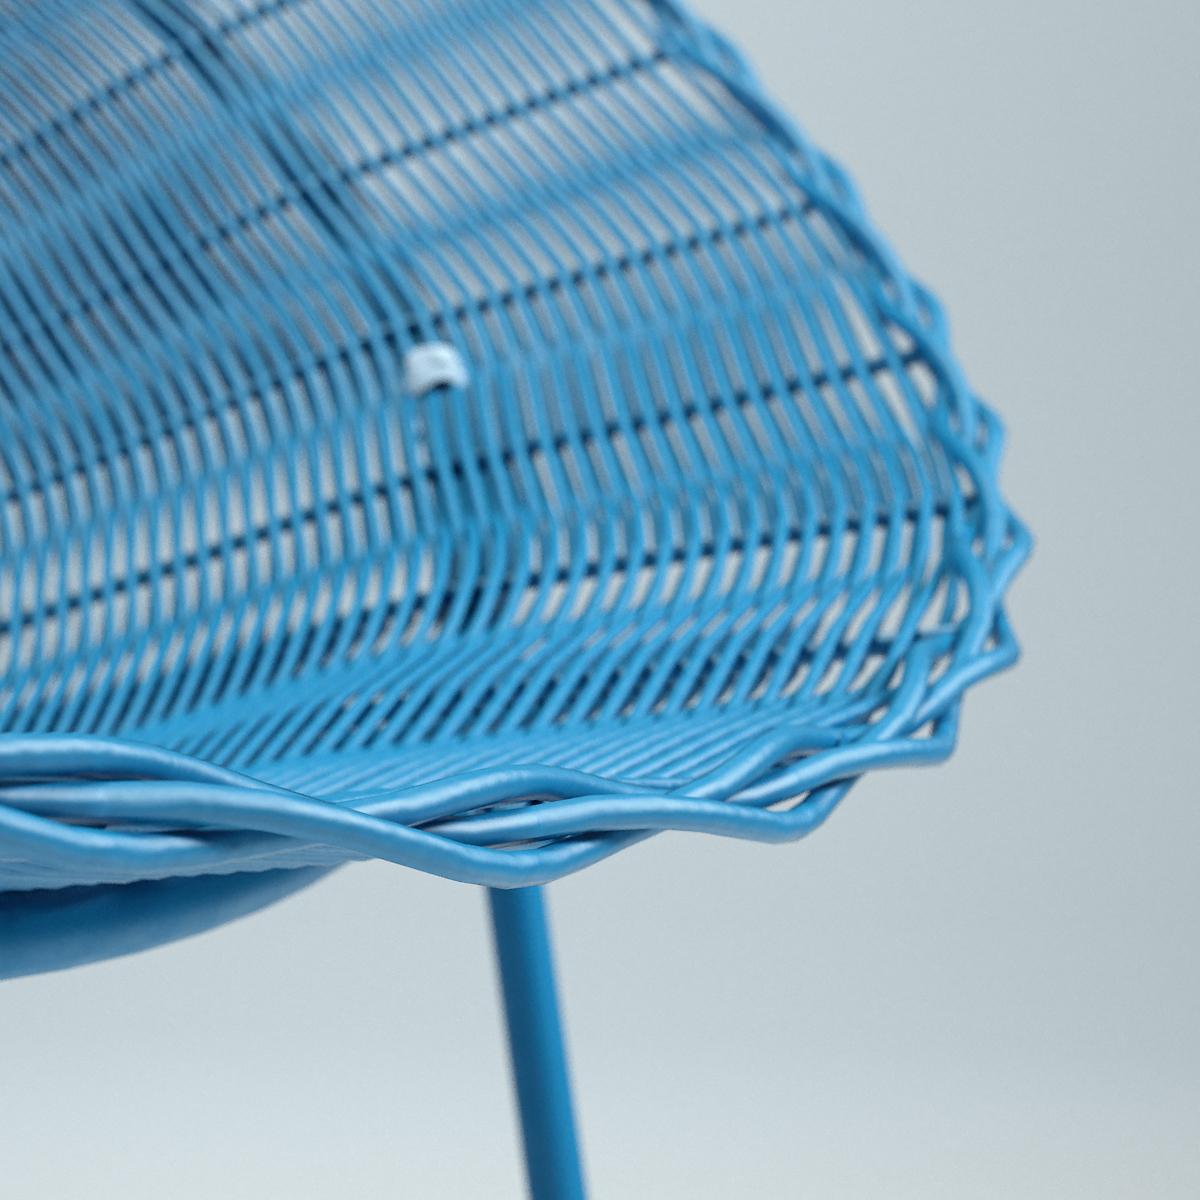 Everyday 3dobjects: 3D // Objects On Behance Jasa Desain